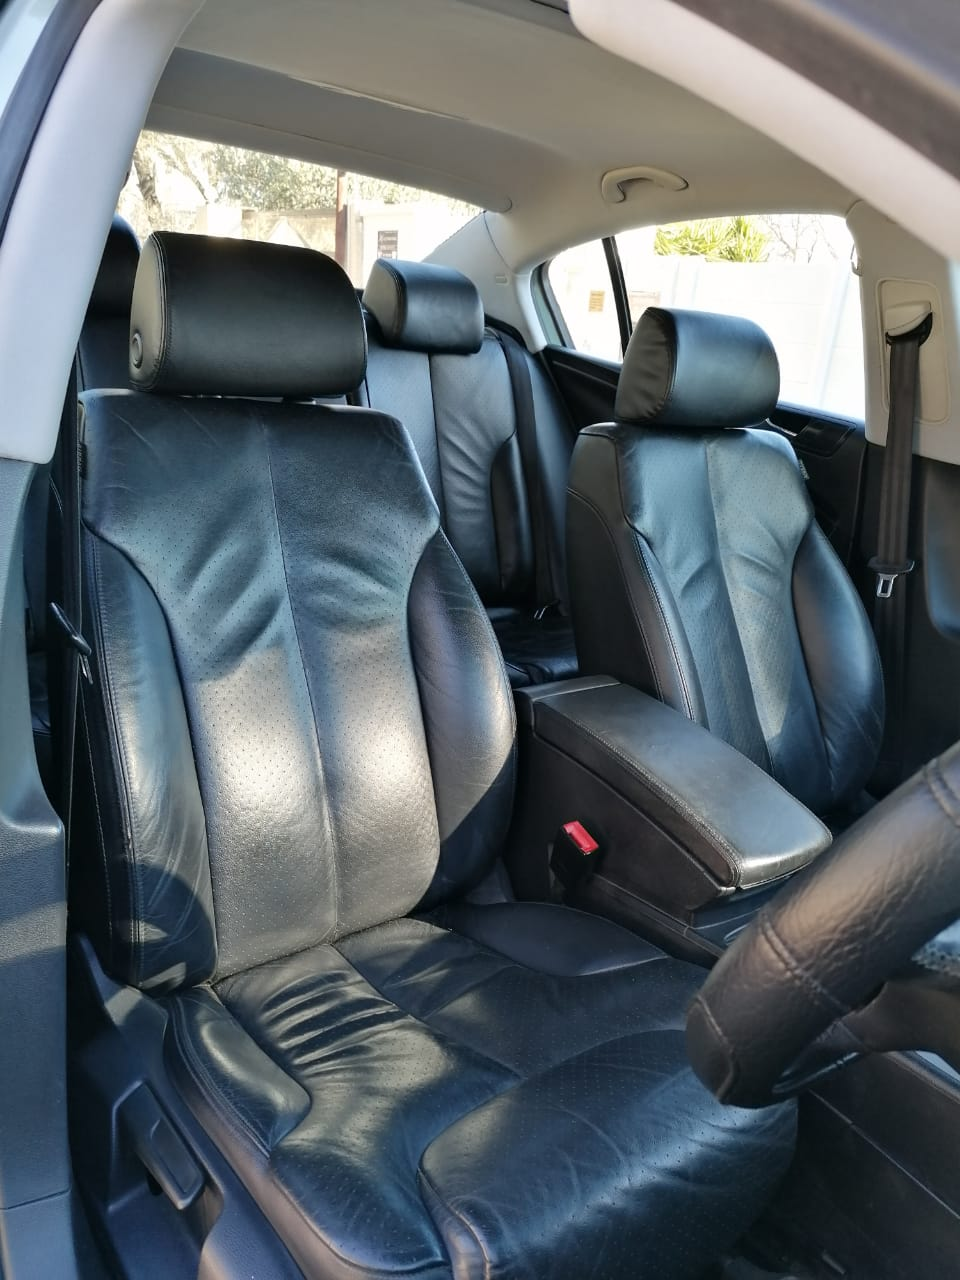 2007 VW Passat 1.9TDI Comfortline